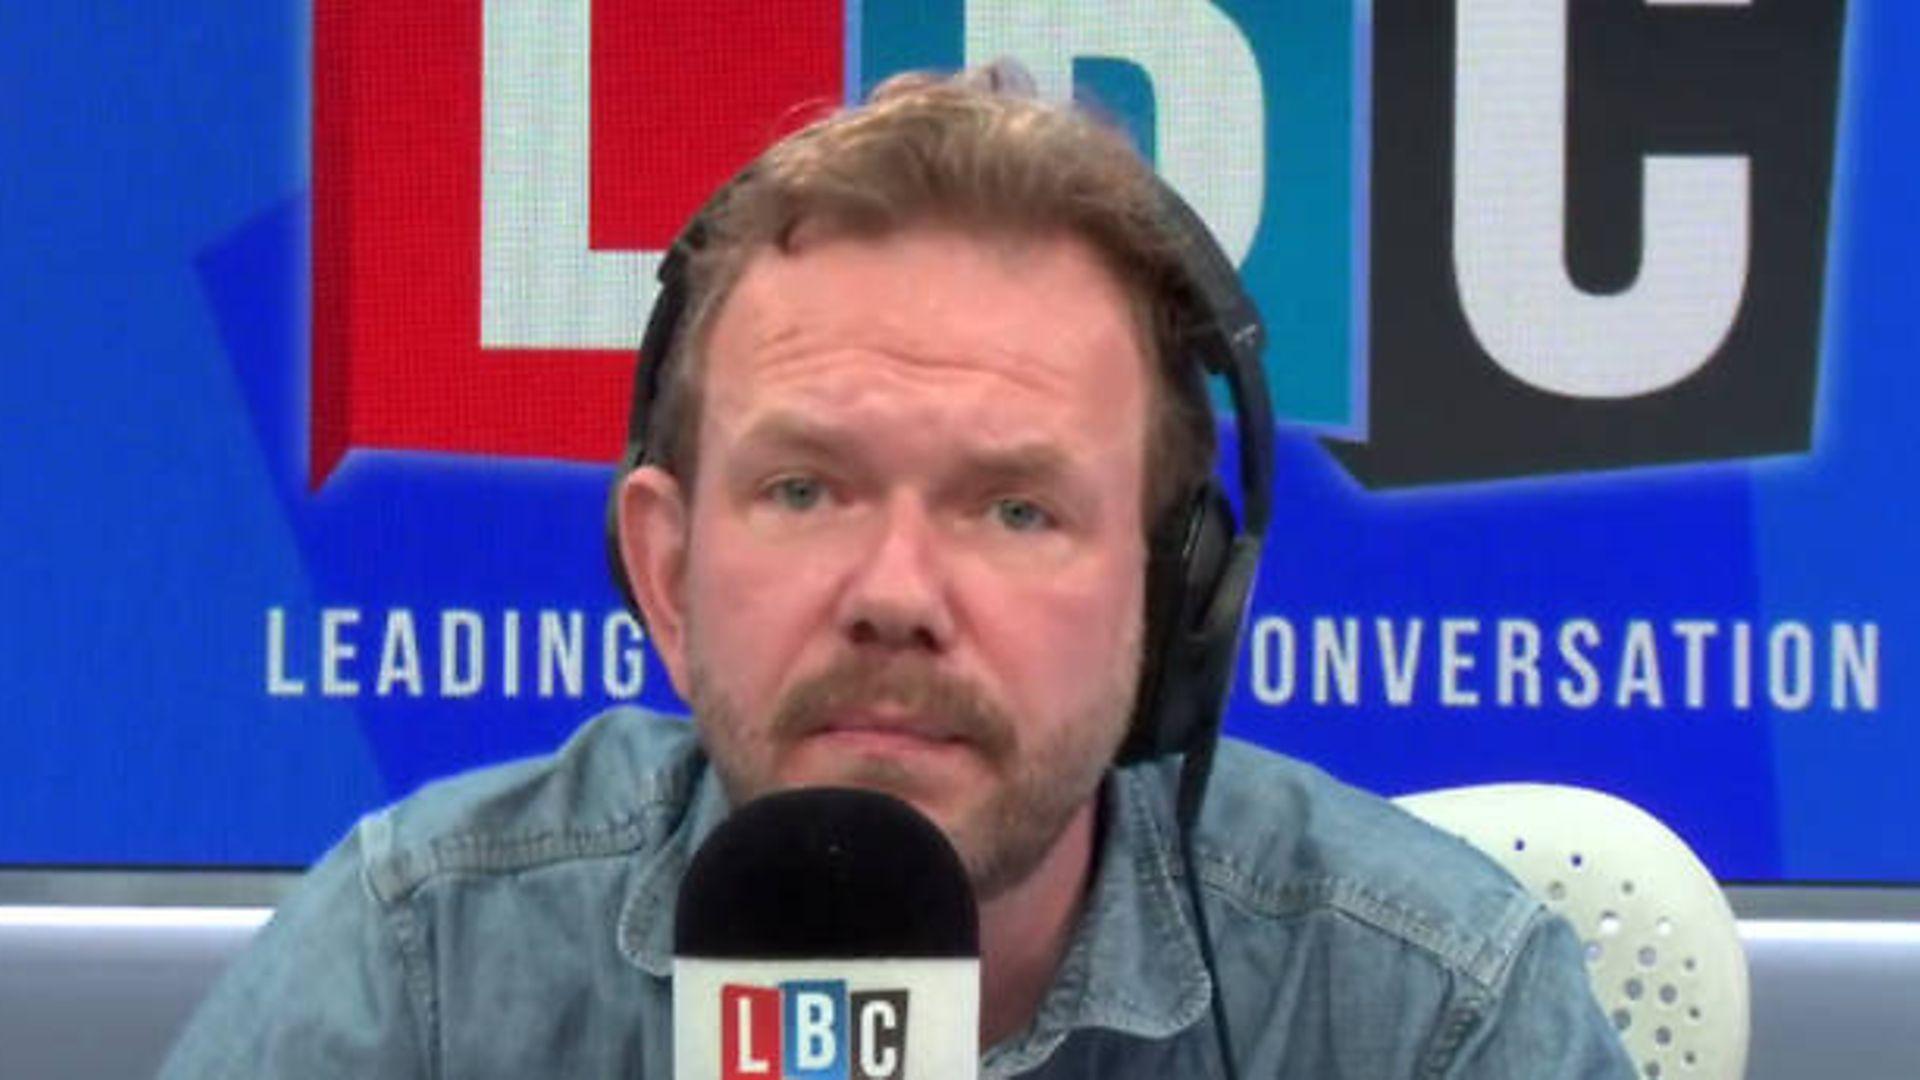 James O'Brien in the LBC Radio studio - Credit: LBC